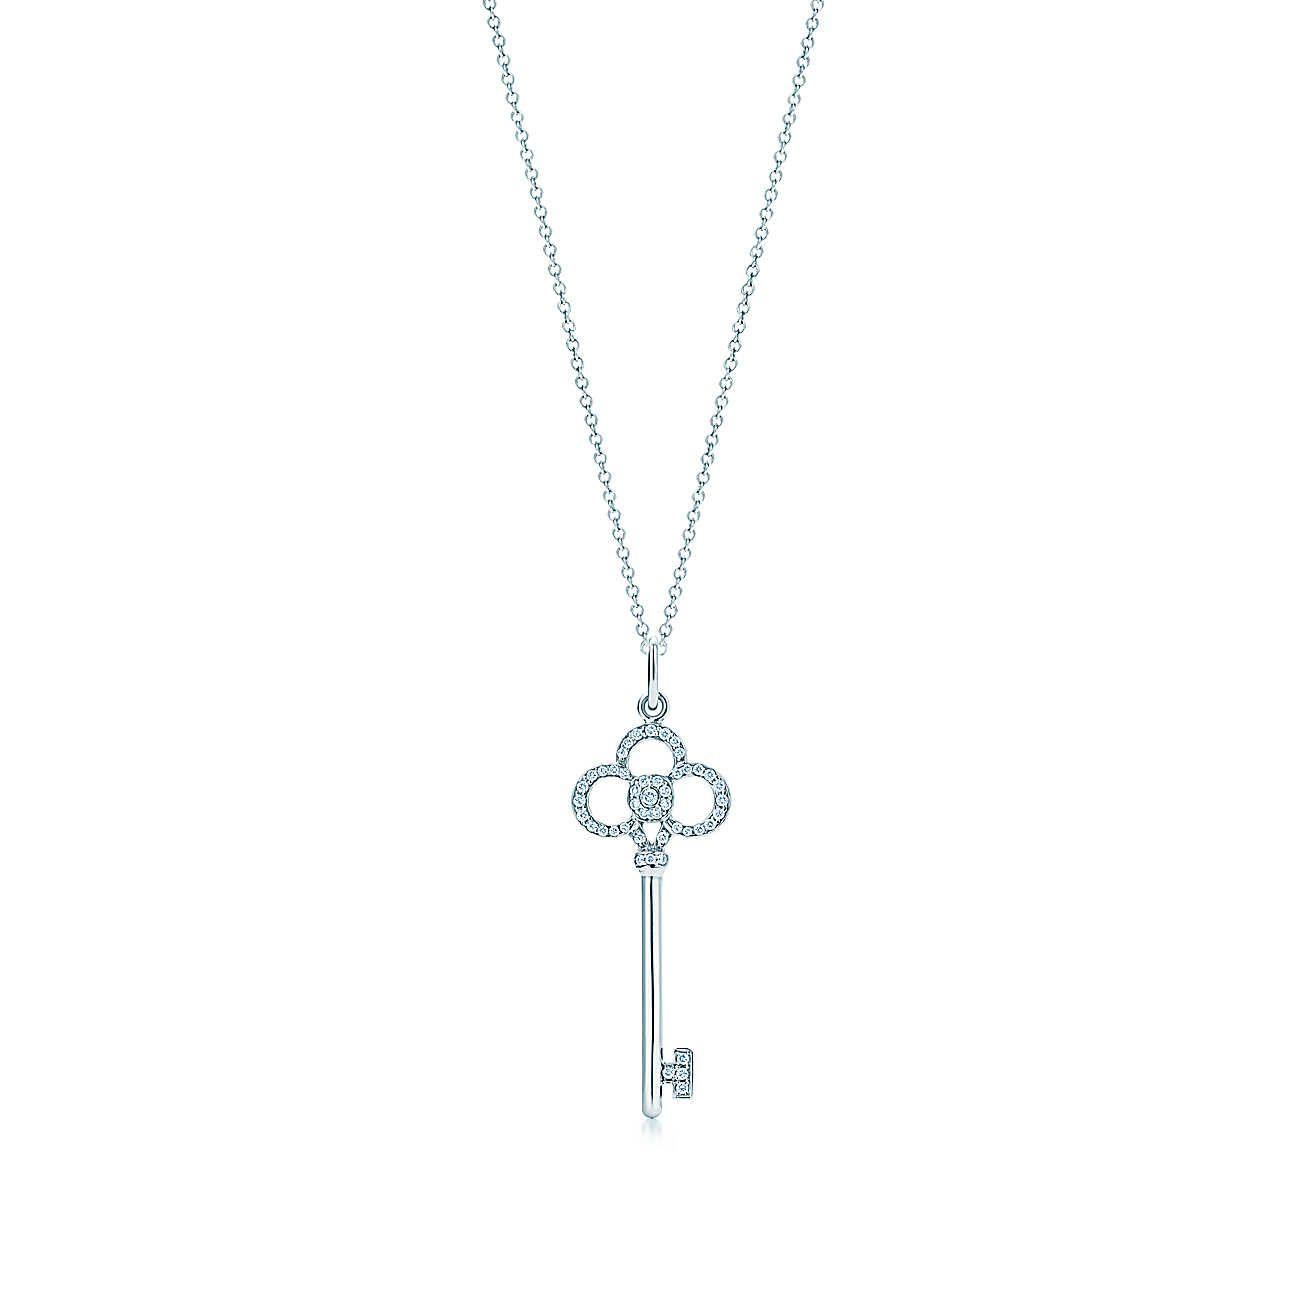 a168547a9 Crown Key Pendant | Clothes/Style | Tiffany key, Key pendant, Pendants